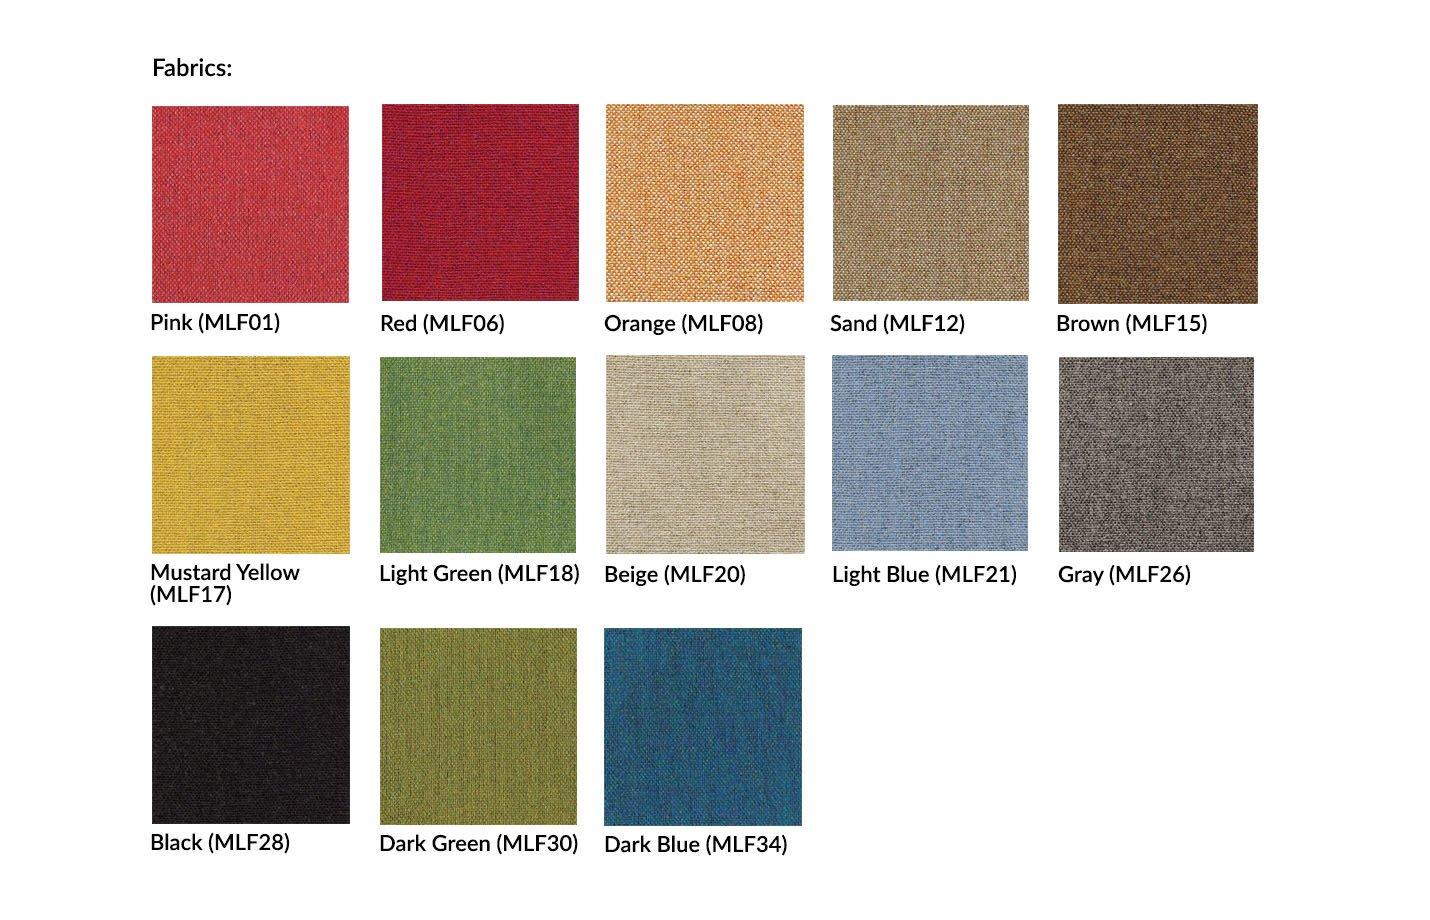 Main-Line-Flax-Fabric-Swatch